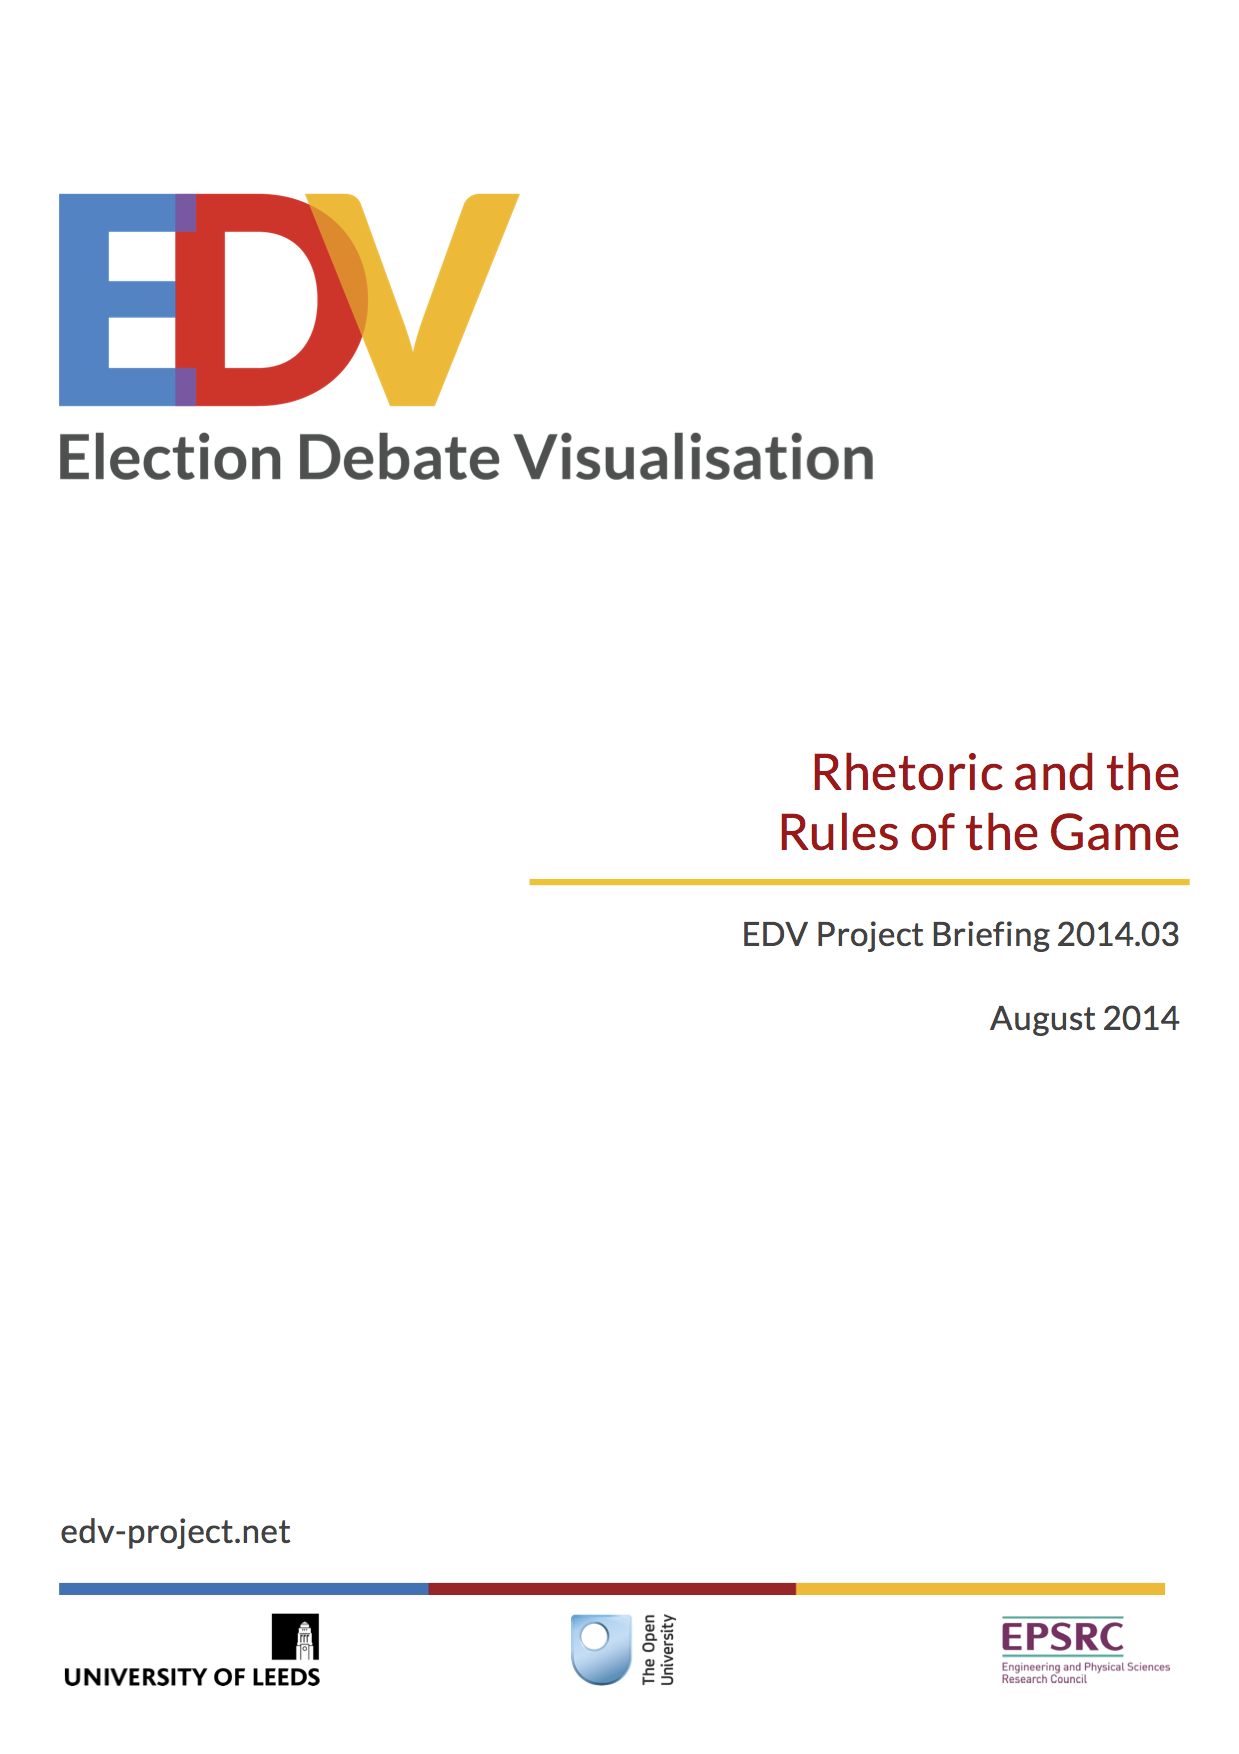 EDV briefing 2014.03